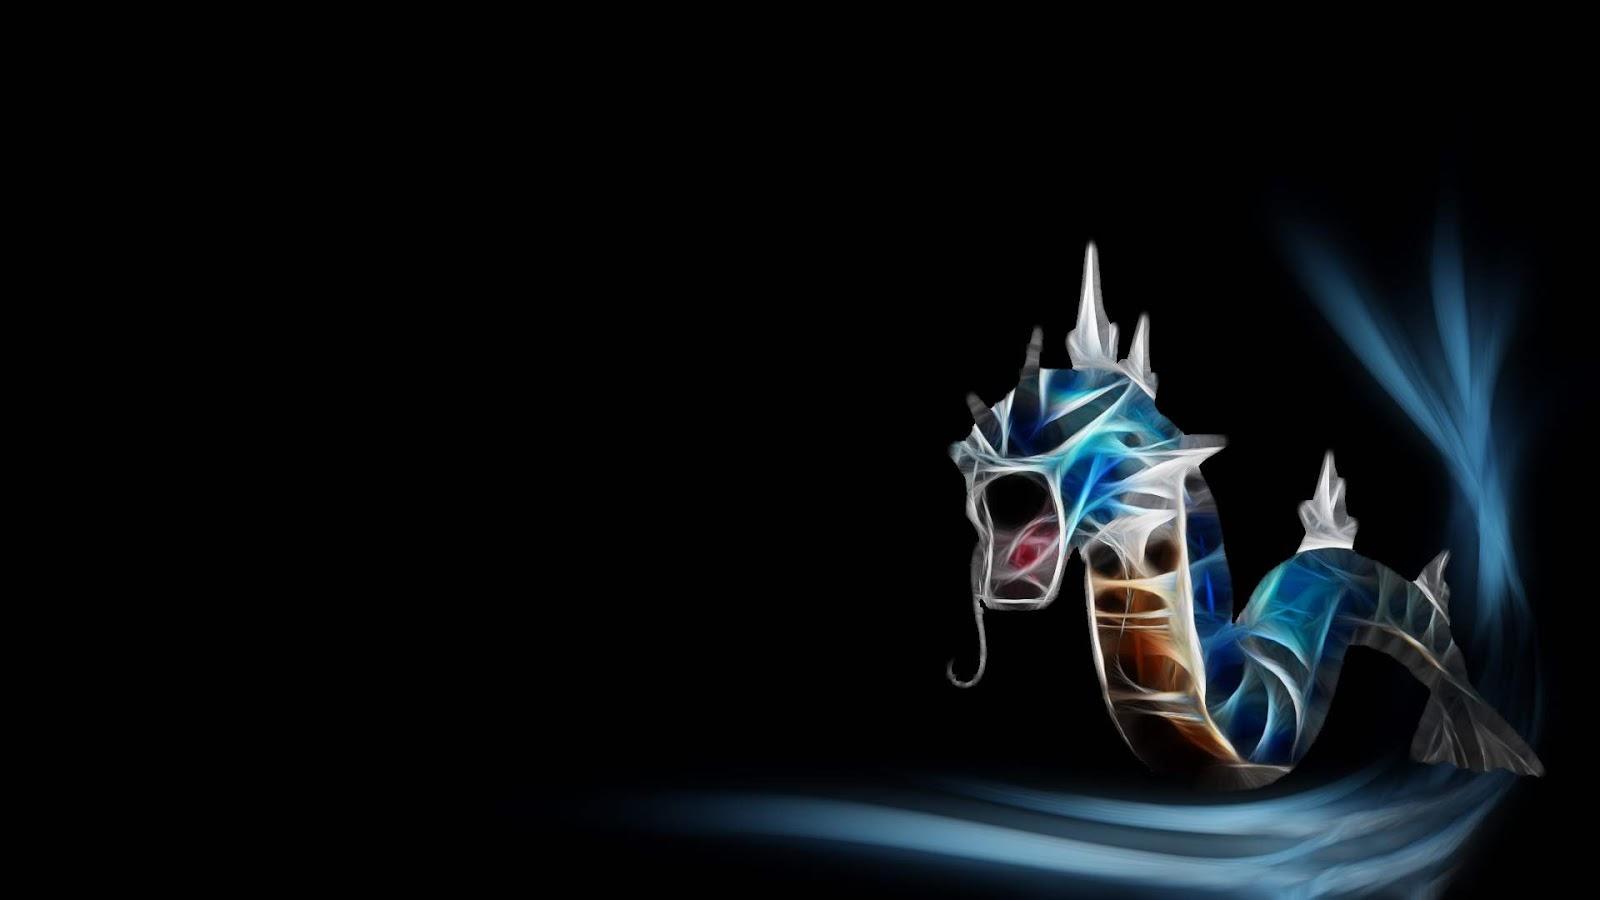 Fondos para whatsapp patada de caballo pokemon fondos for Imagenes fondo escritorio